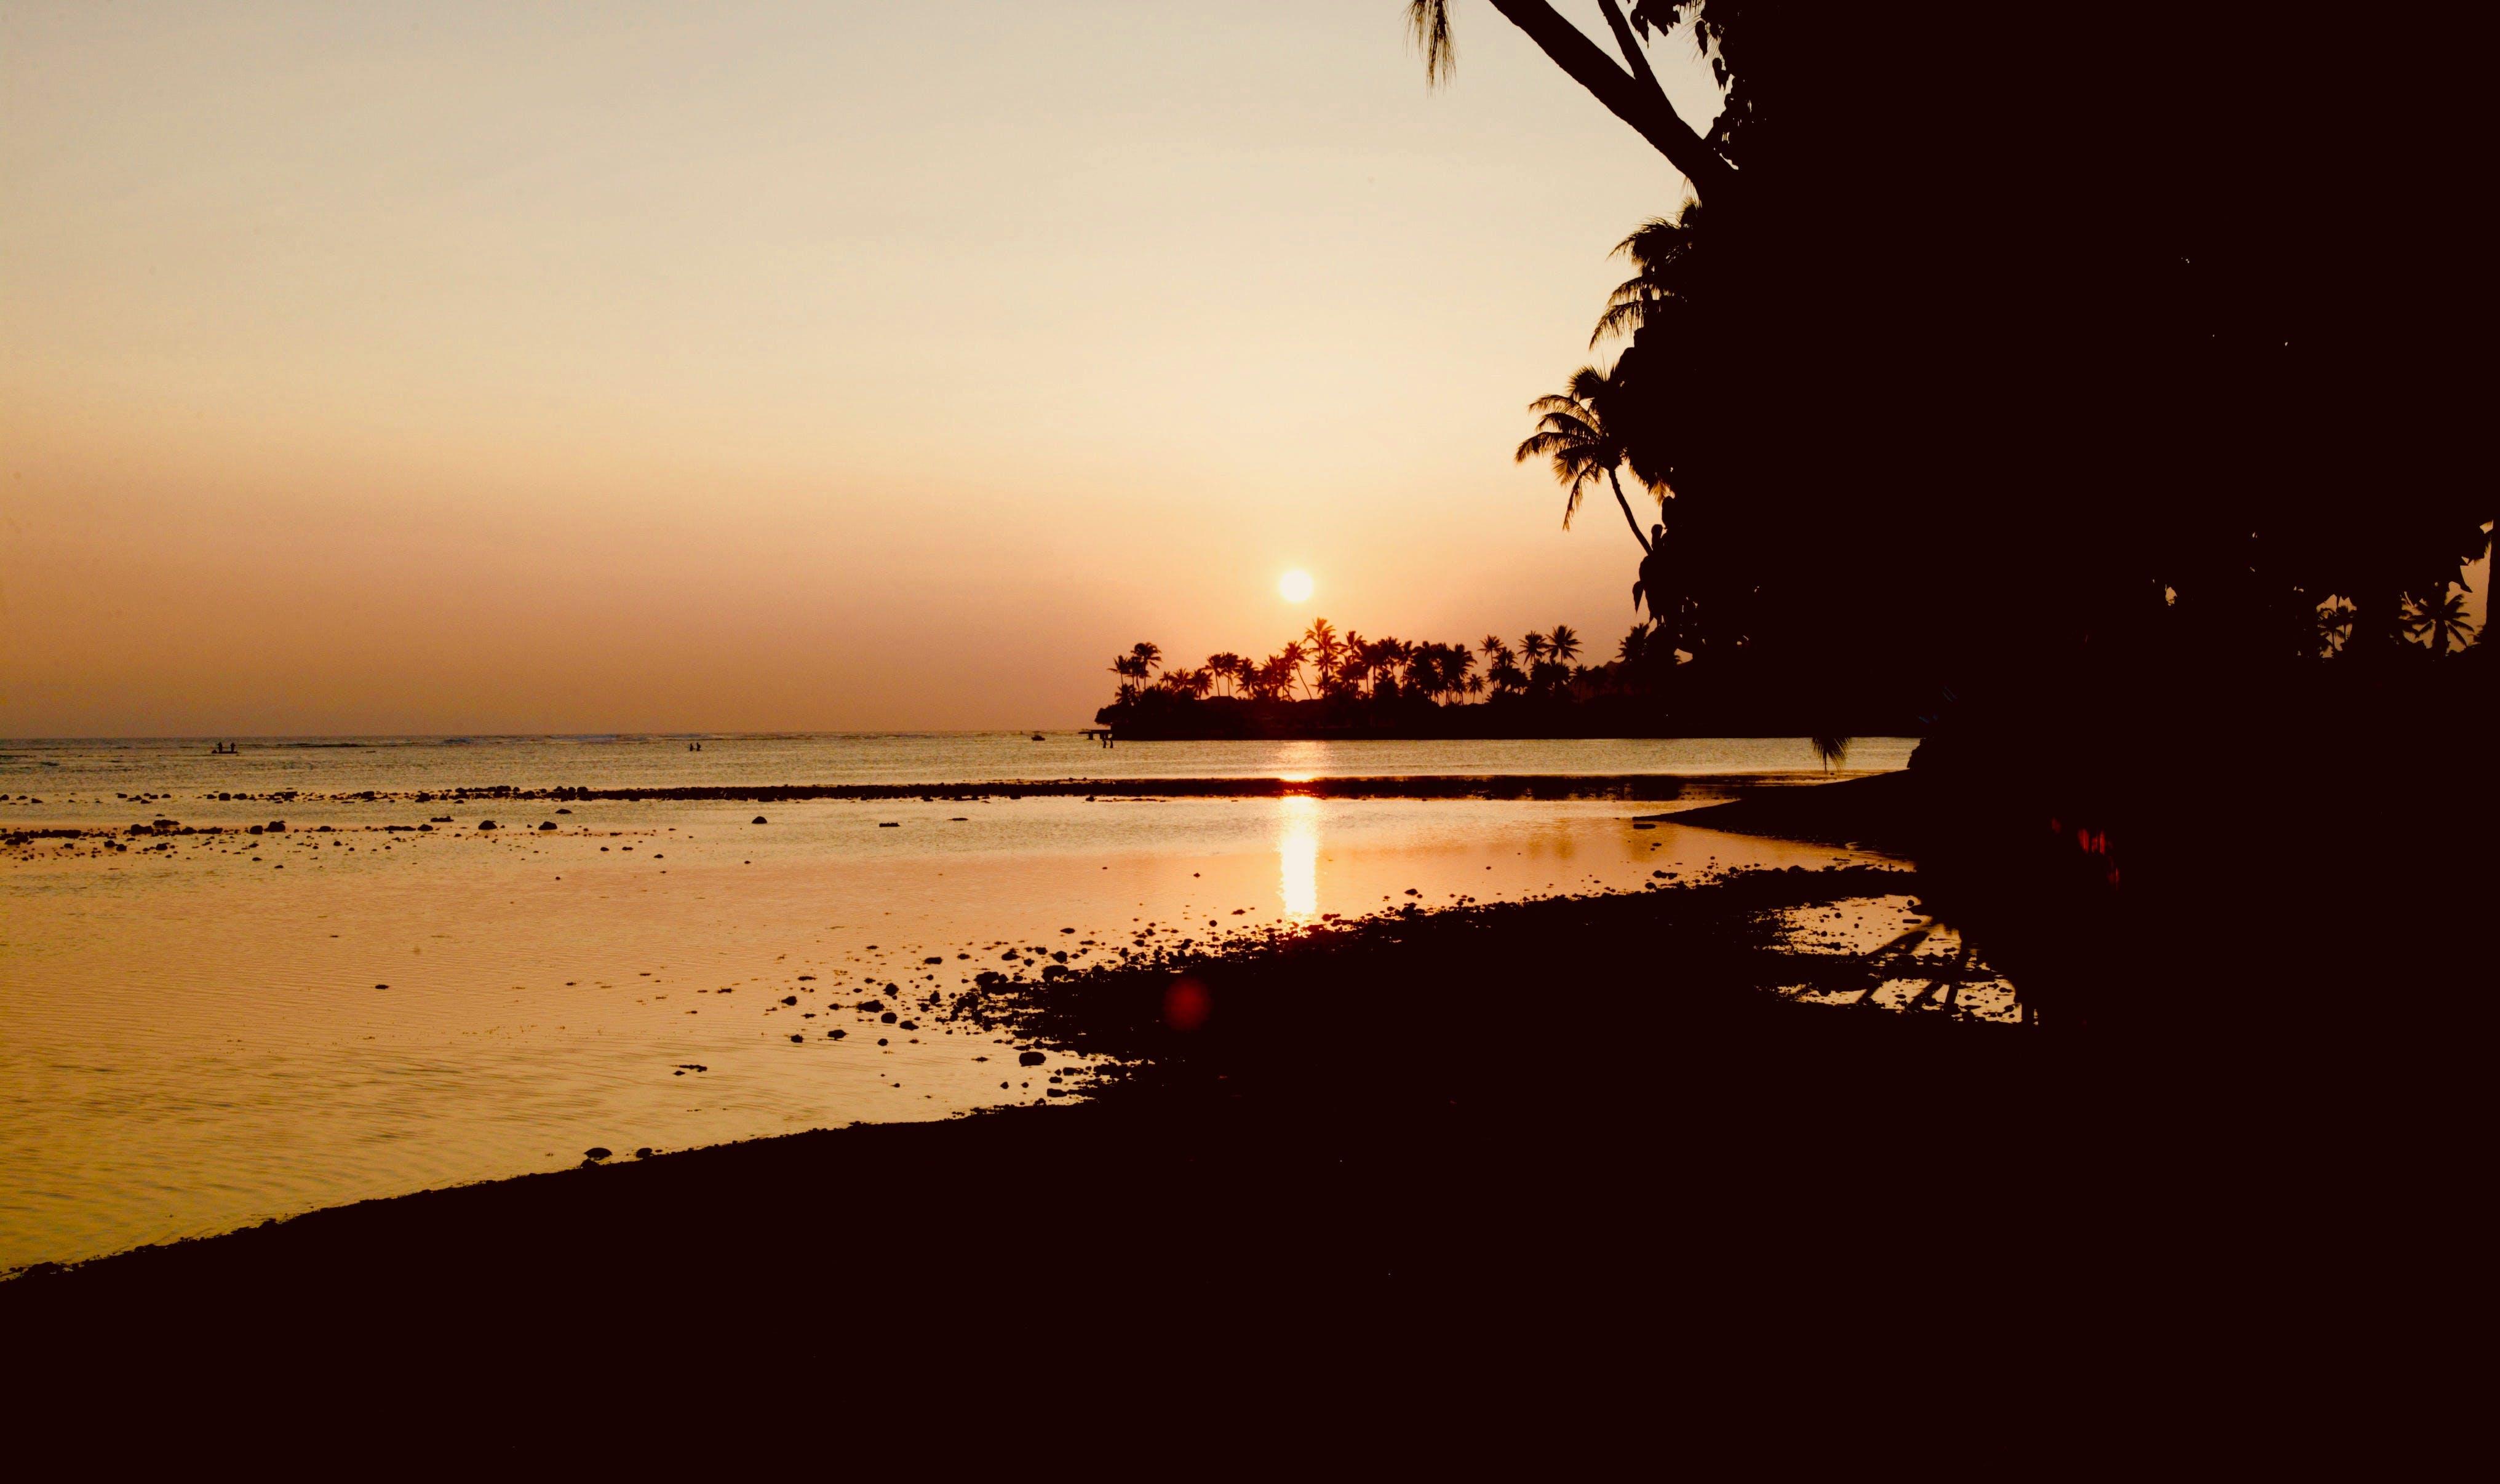 Free stock photo of beach, ocean, sunset, tropical